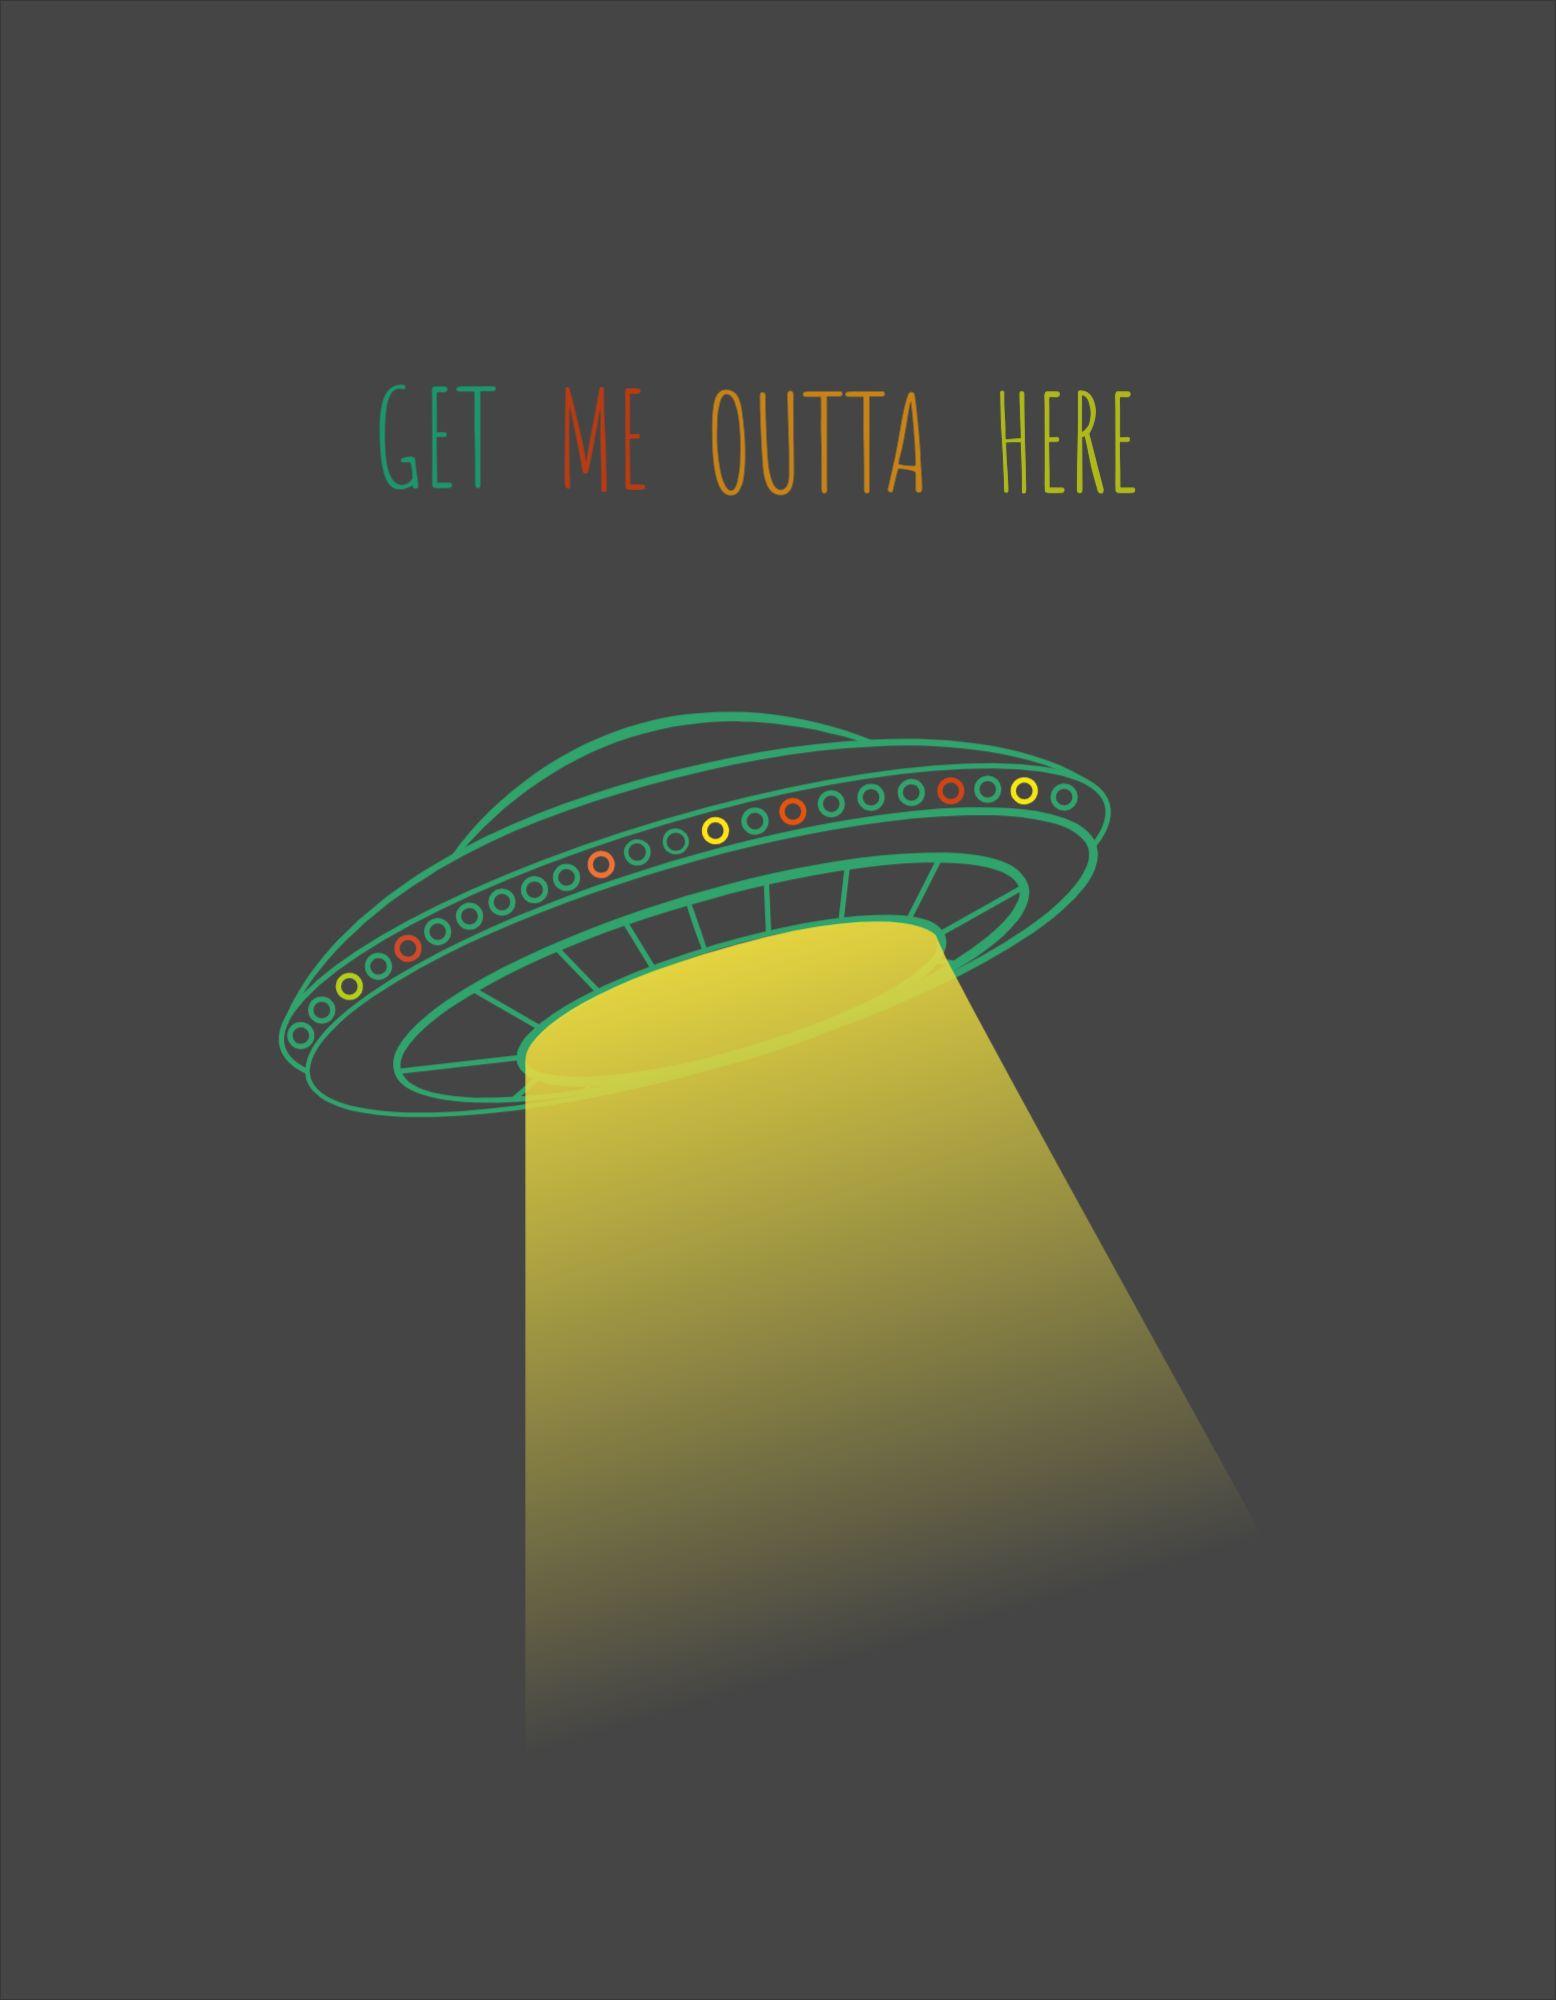 UFO T-Shirt Design Templates